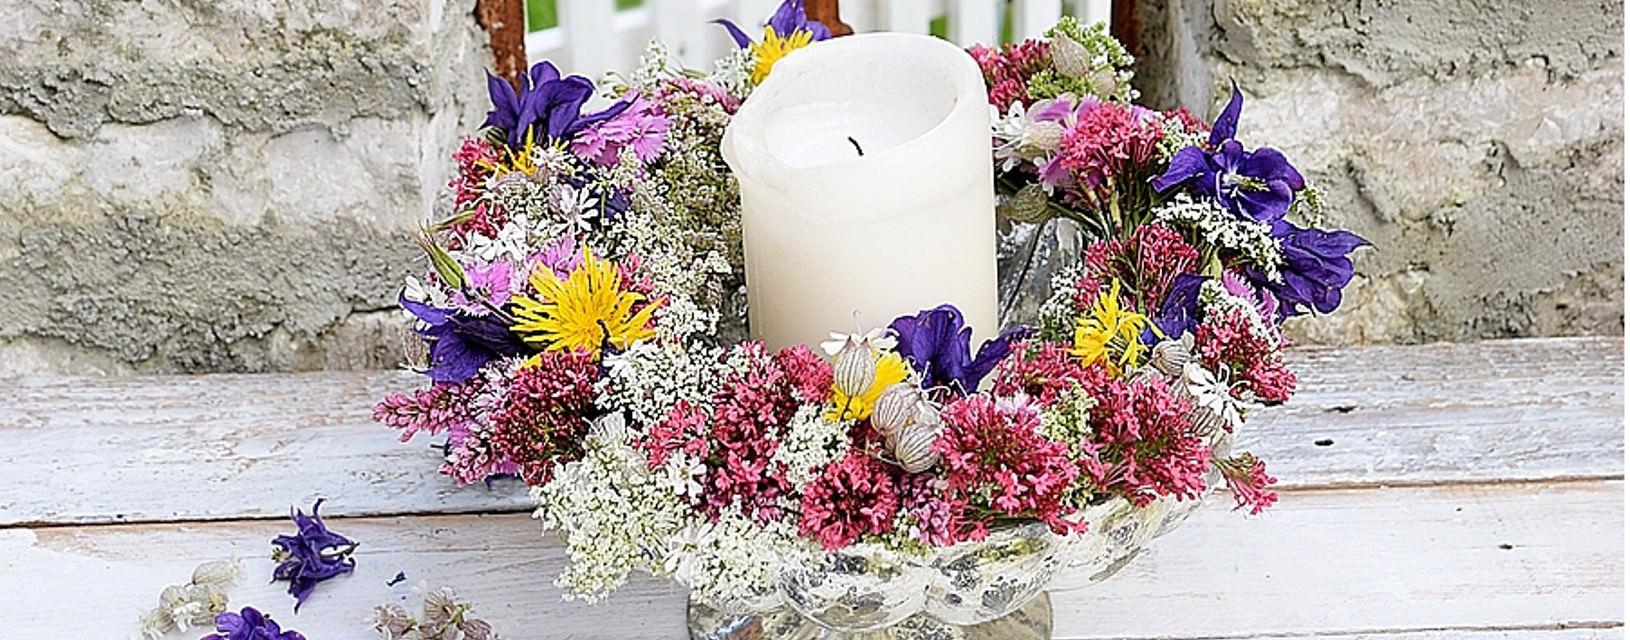 DIY-Anleitung Blumenkranz binden